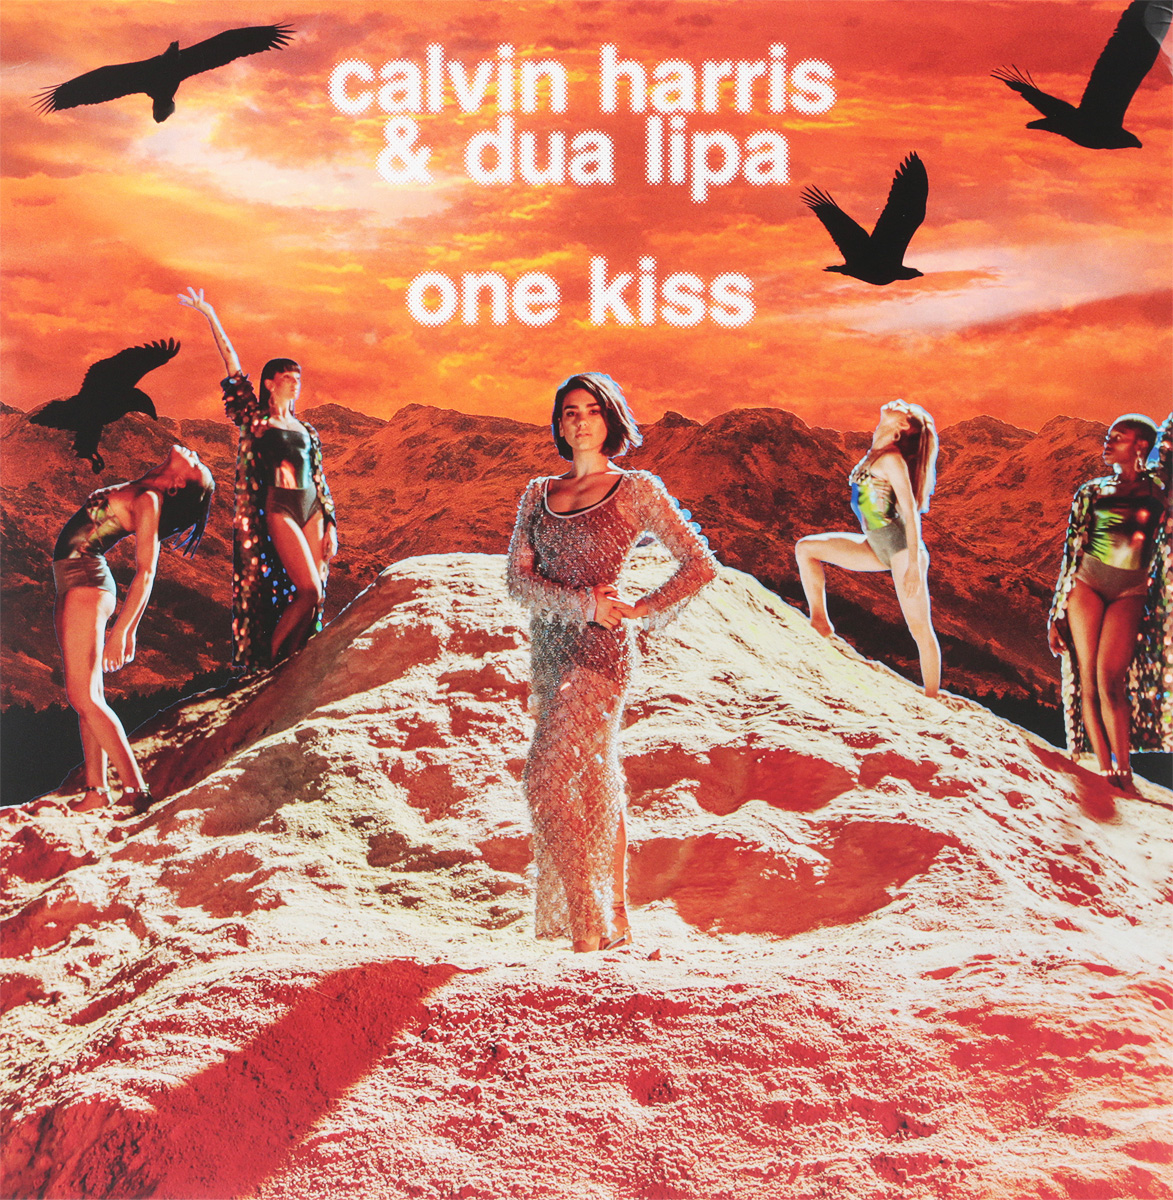 цена на Кельвин Харрис,Дуа Липа Calvin Harris, Dua Lipa. One Kiss (LP)